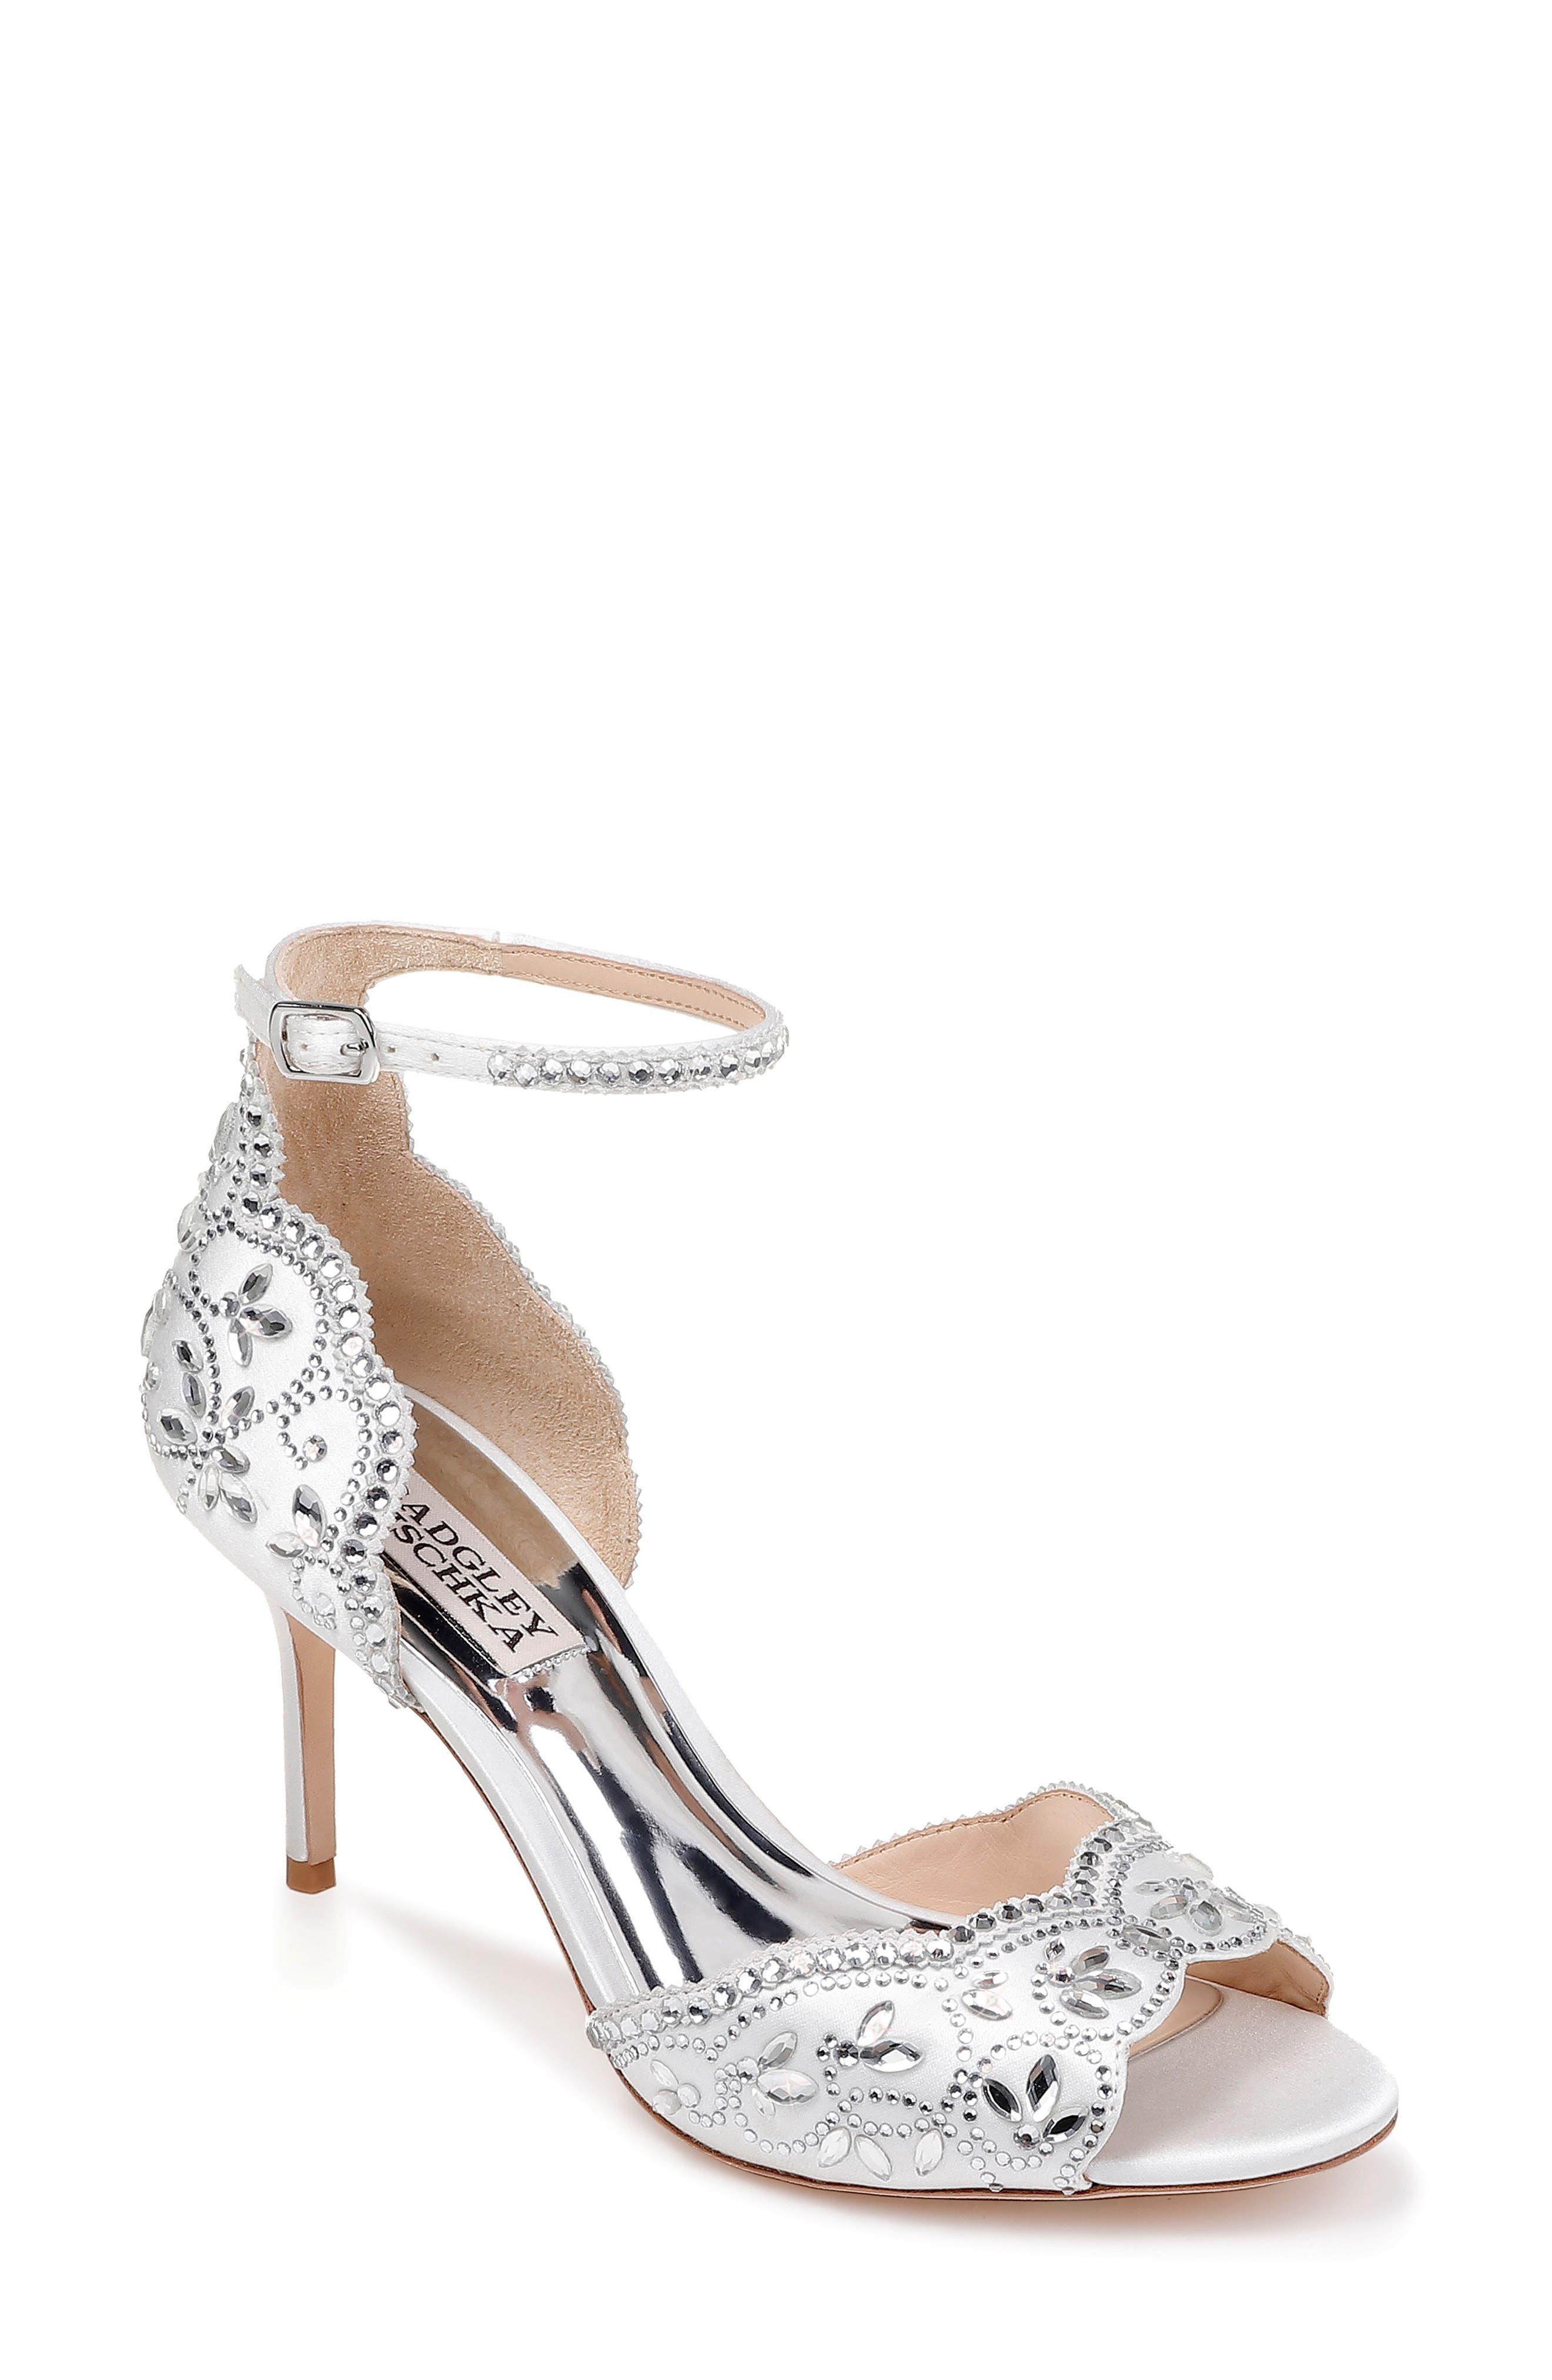 Badgley Mischka Crystal Embellished Sandal, White